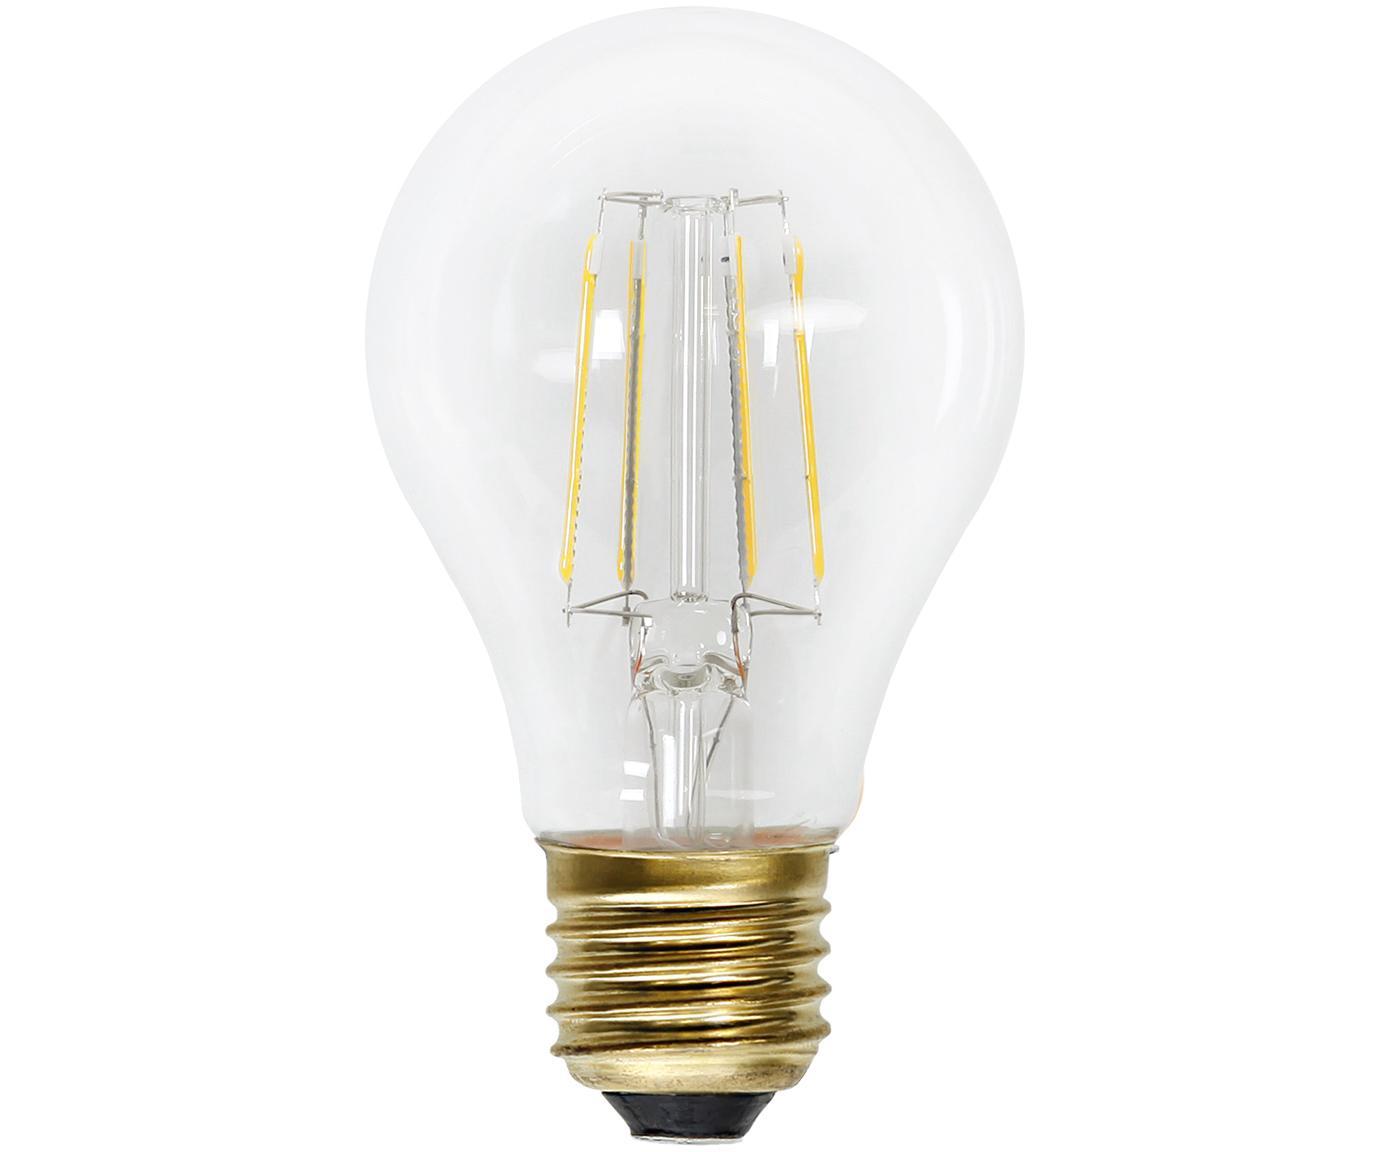 Lampadina a LED Airtight Four (E27 / 2,3Watt), Paralume: vetro, Base lampadina: Ottone, Trasparente, ottone, Ø 6 x Alt. 11 cm